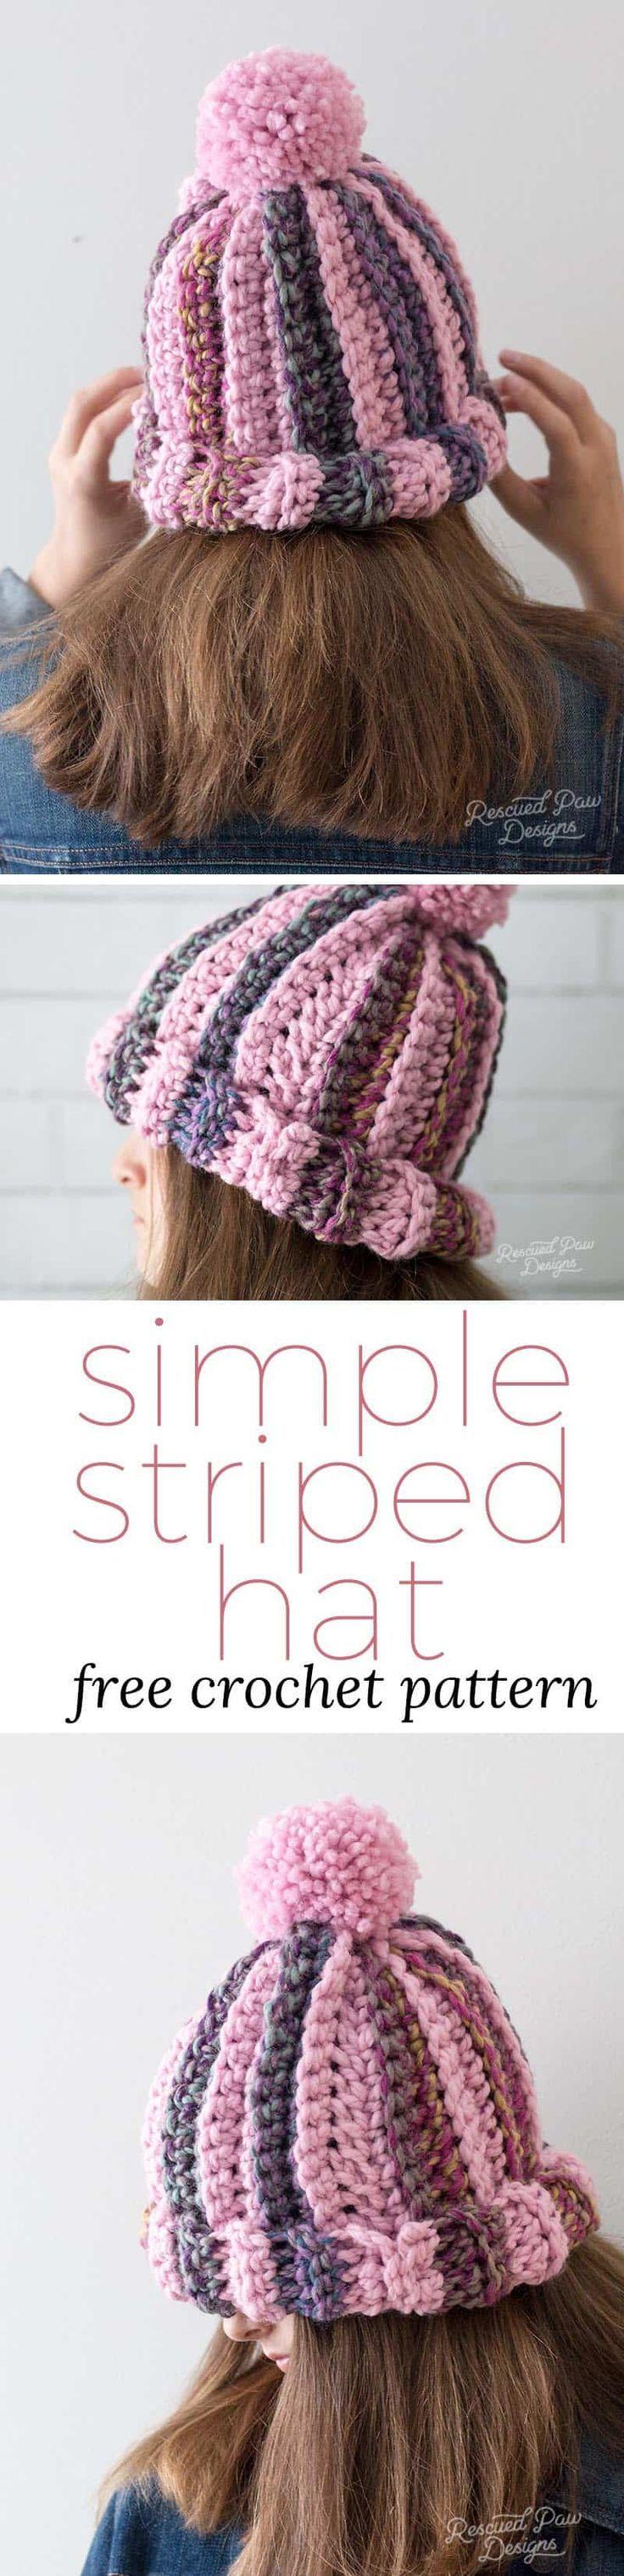 Striped Crochet Hat Pattern   Chunky yarn, Hat crochet and Yarns